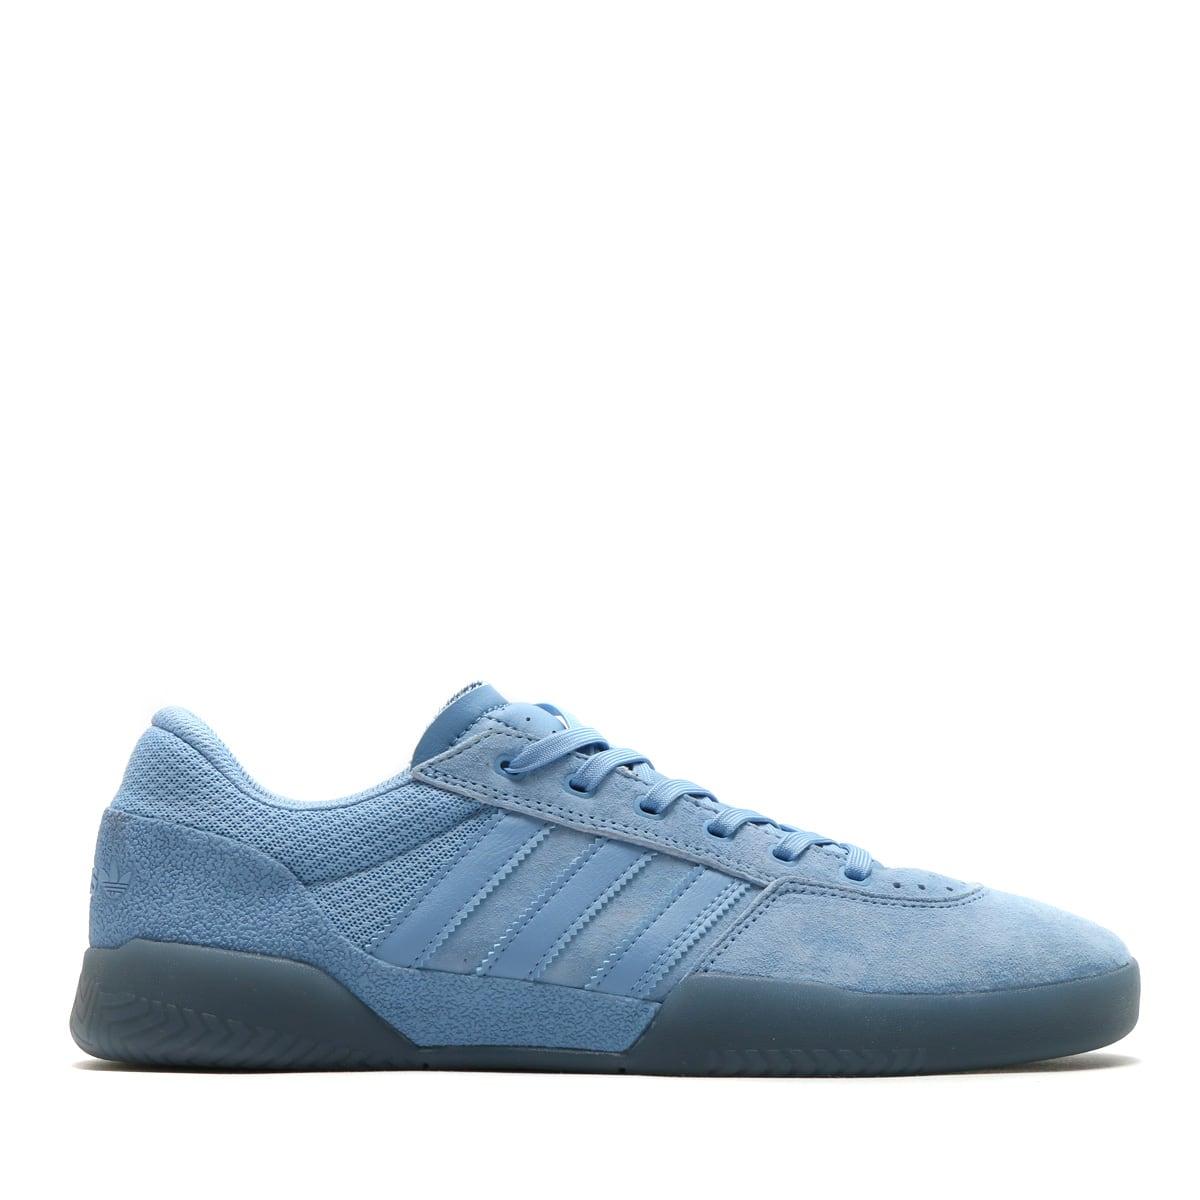 adidas Originals CITY CUP Ash Blue/Raw